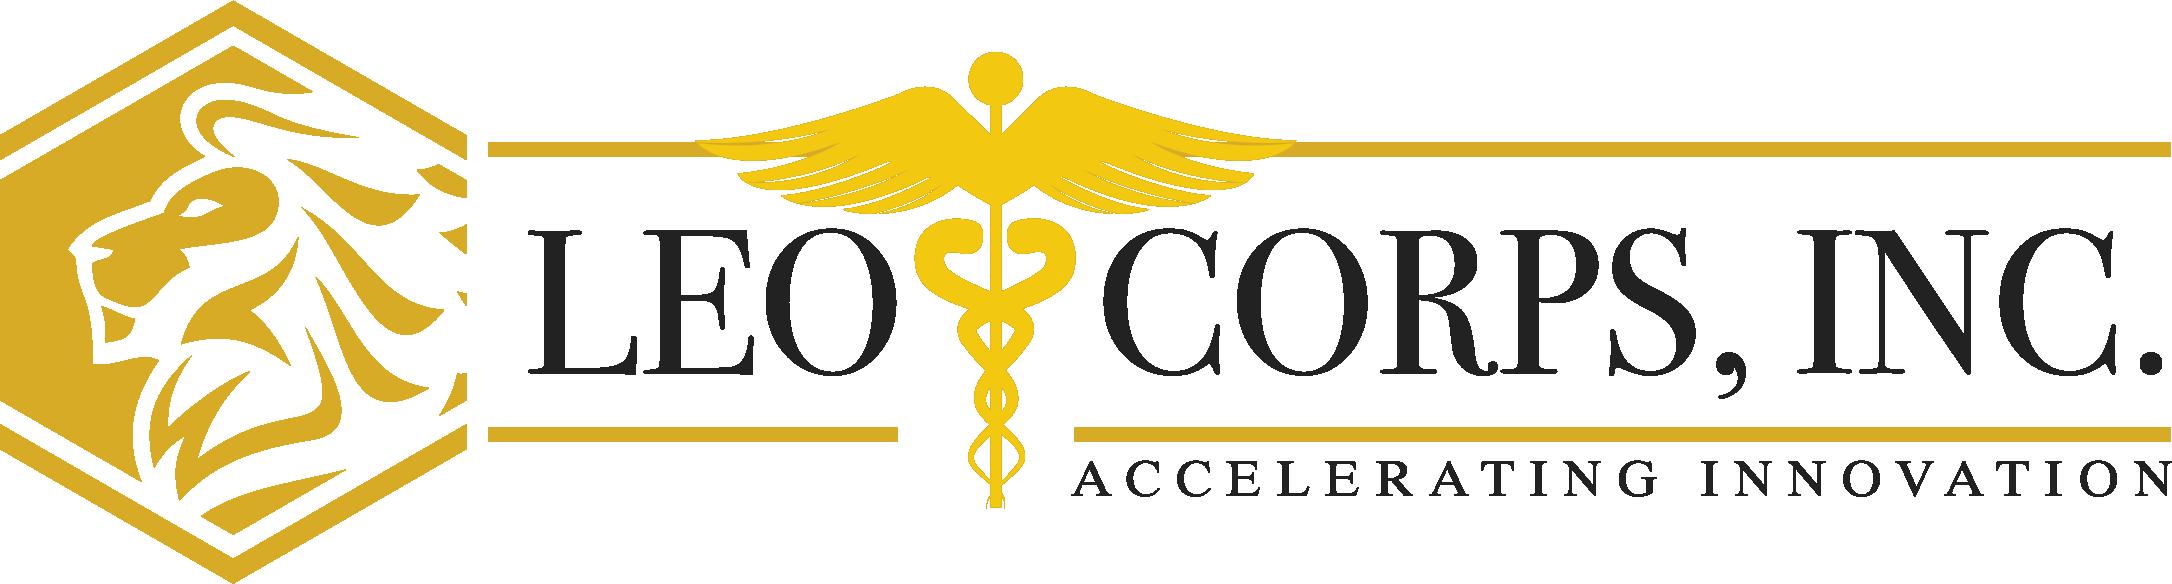 Leo Corps, Inc.